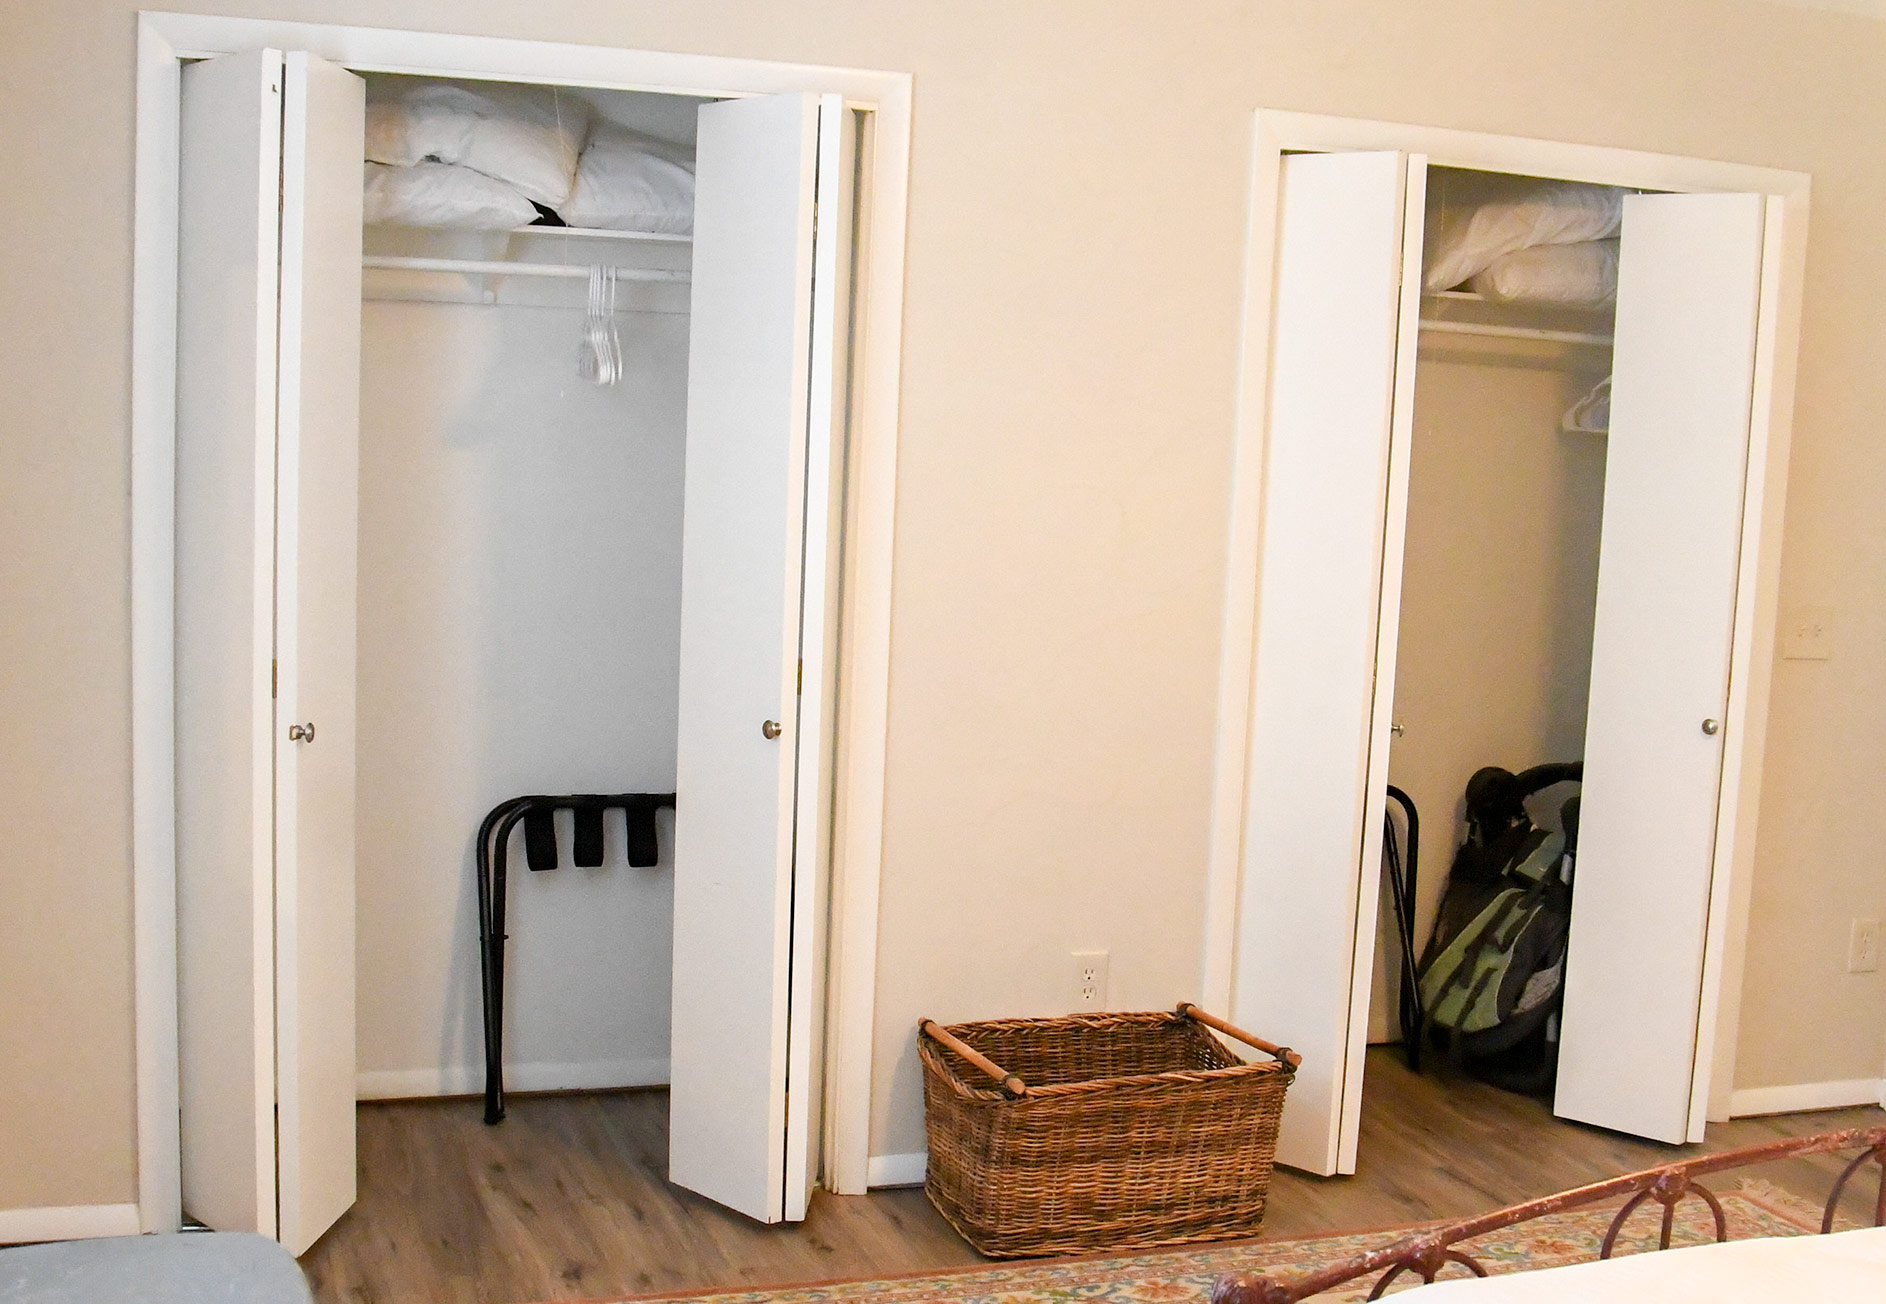 Lake City Rental - Bedroom Closets